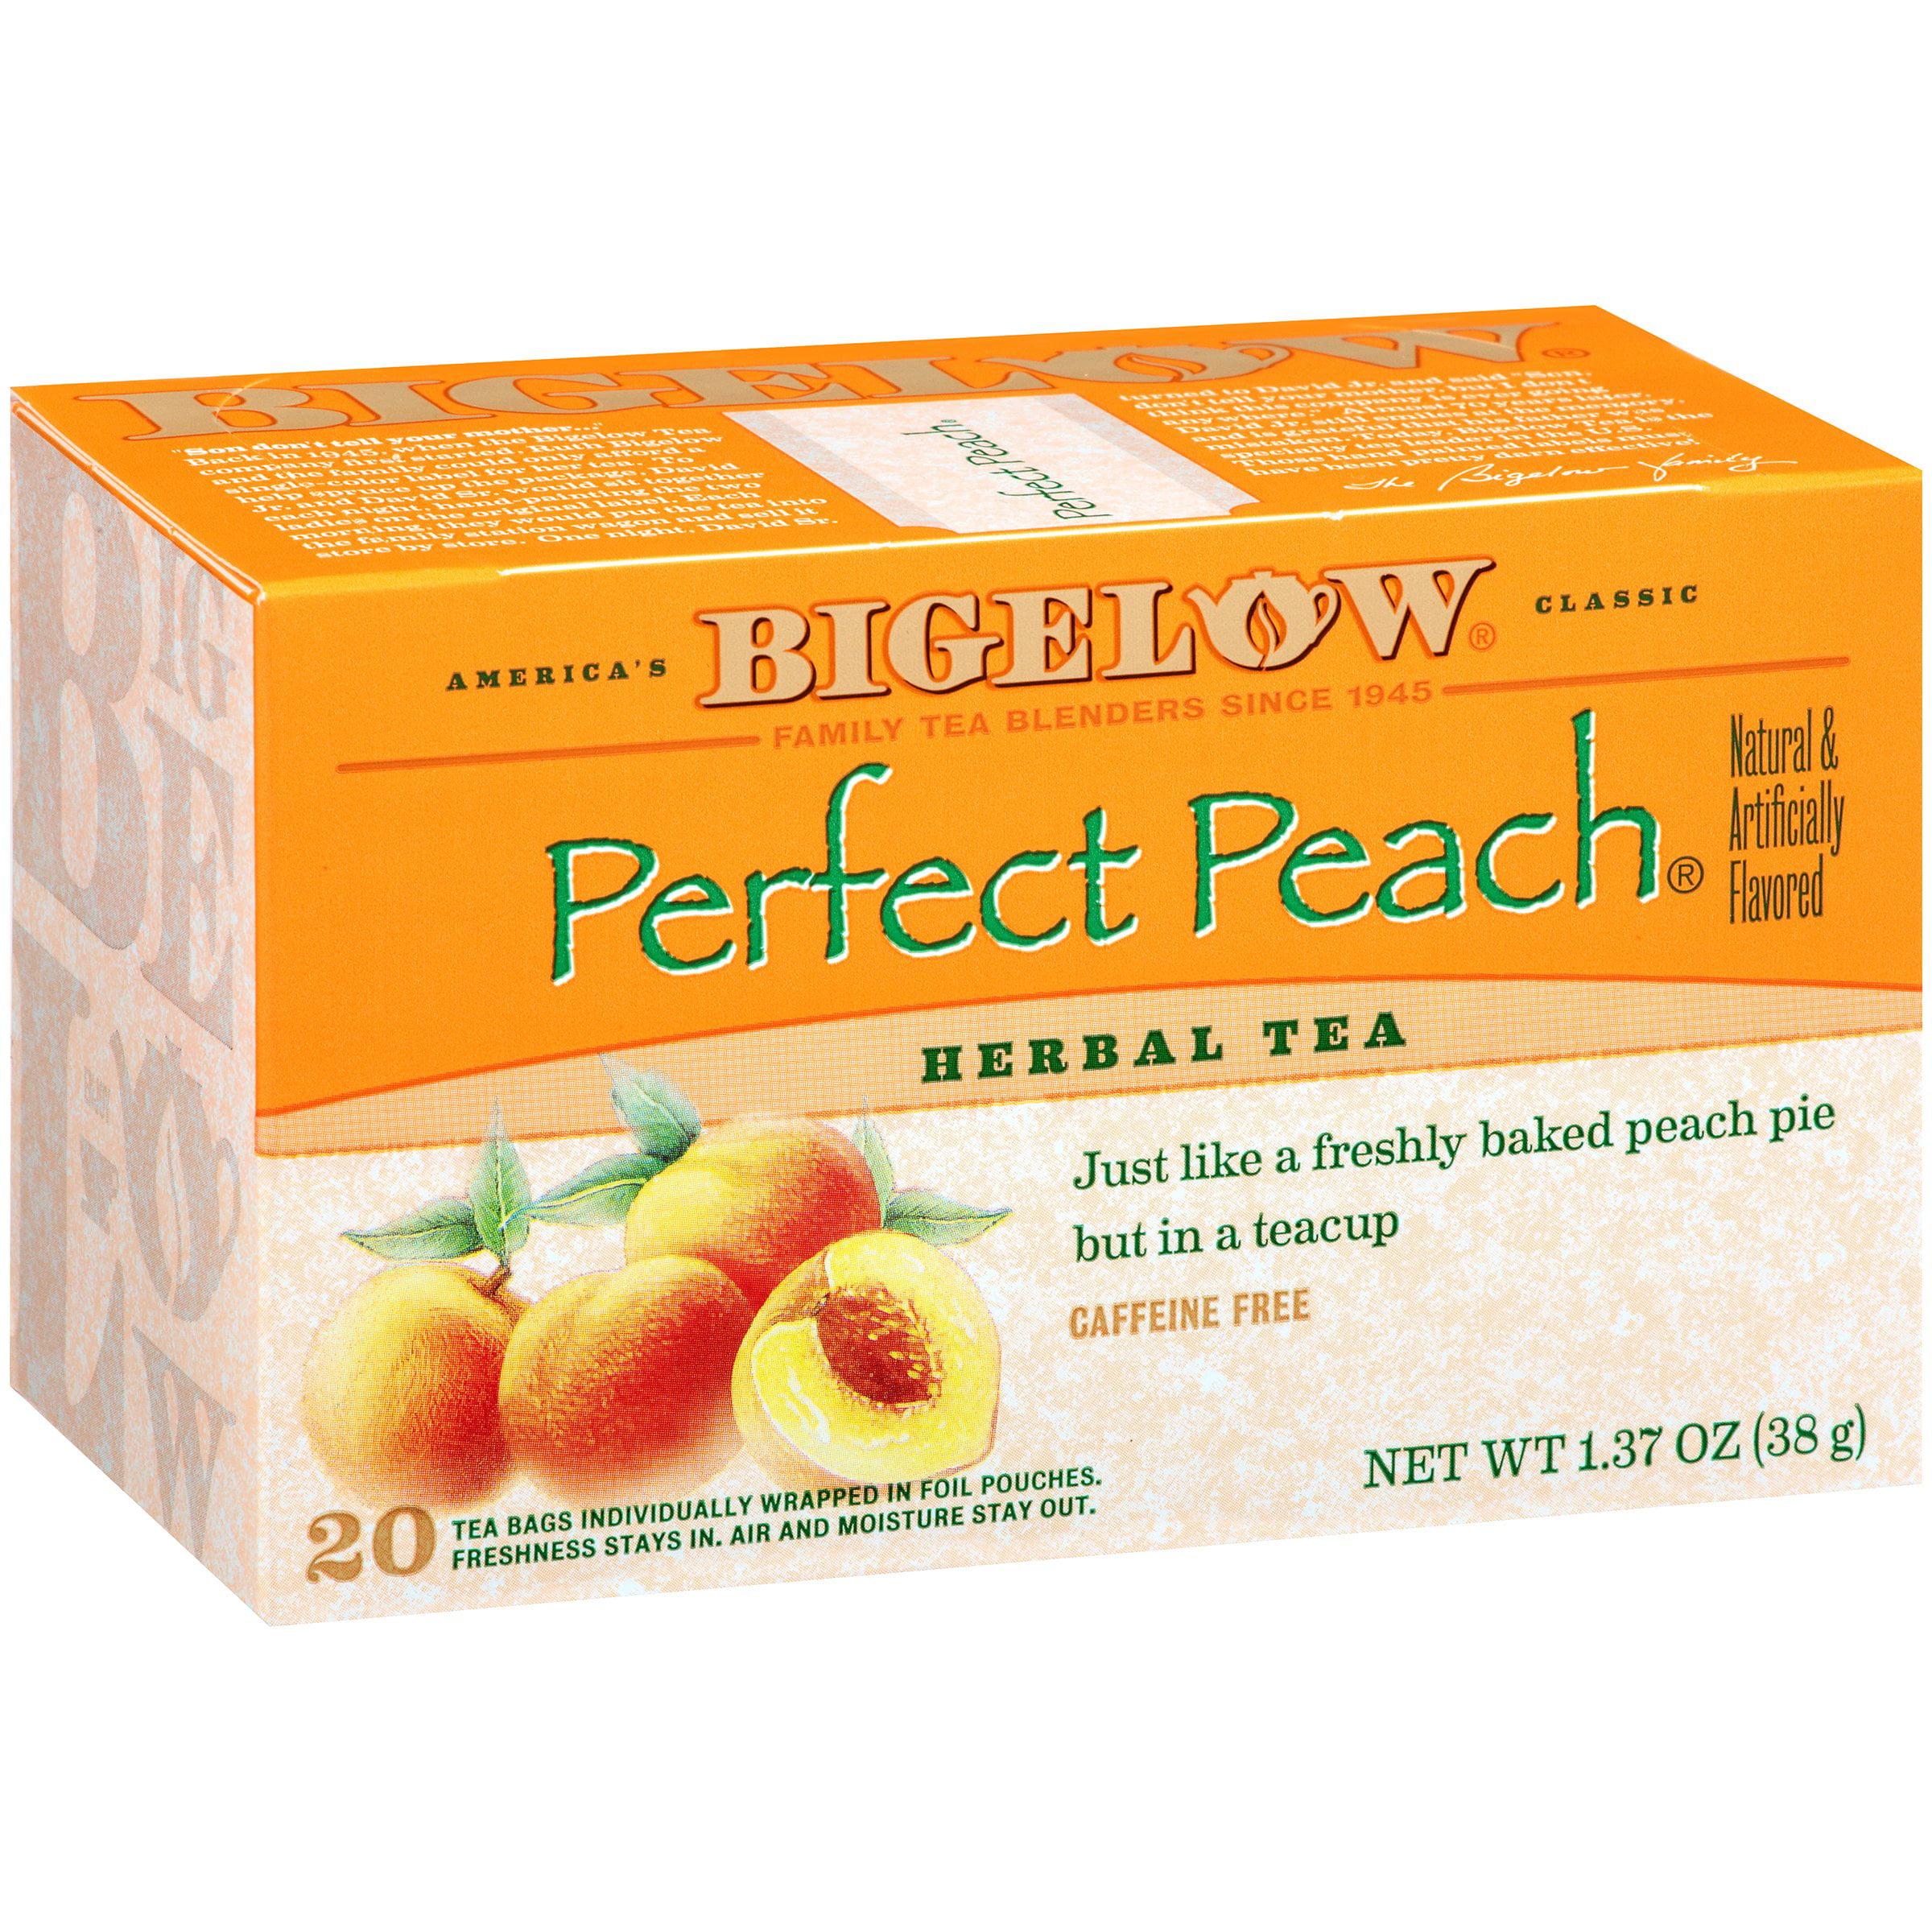 Bigelow Perfect Peach Herbal Tea 1.37 oz. Box by RC Bigelow, Inc.,